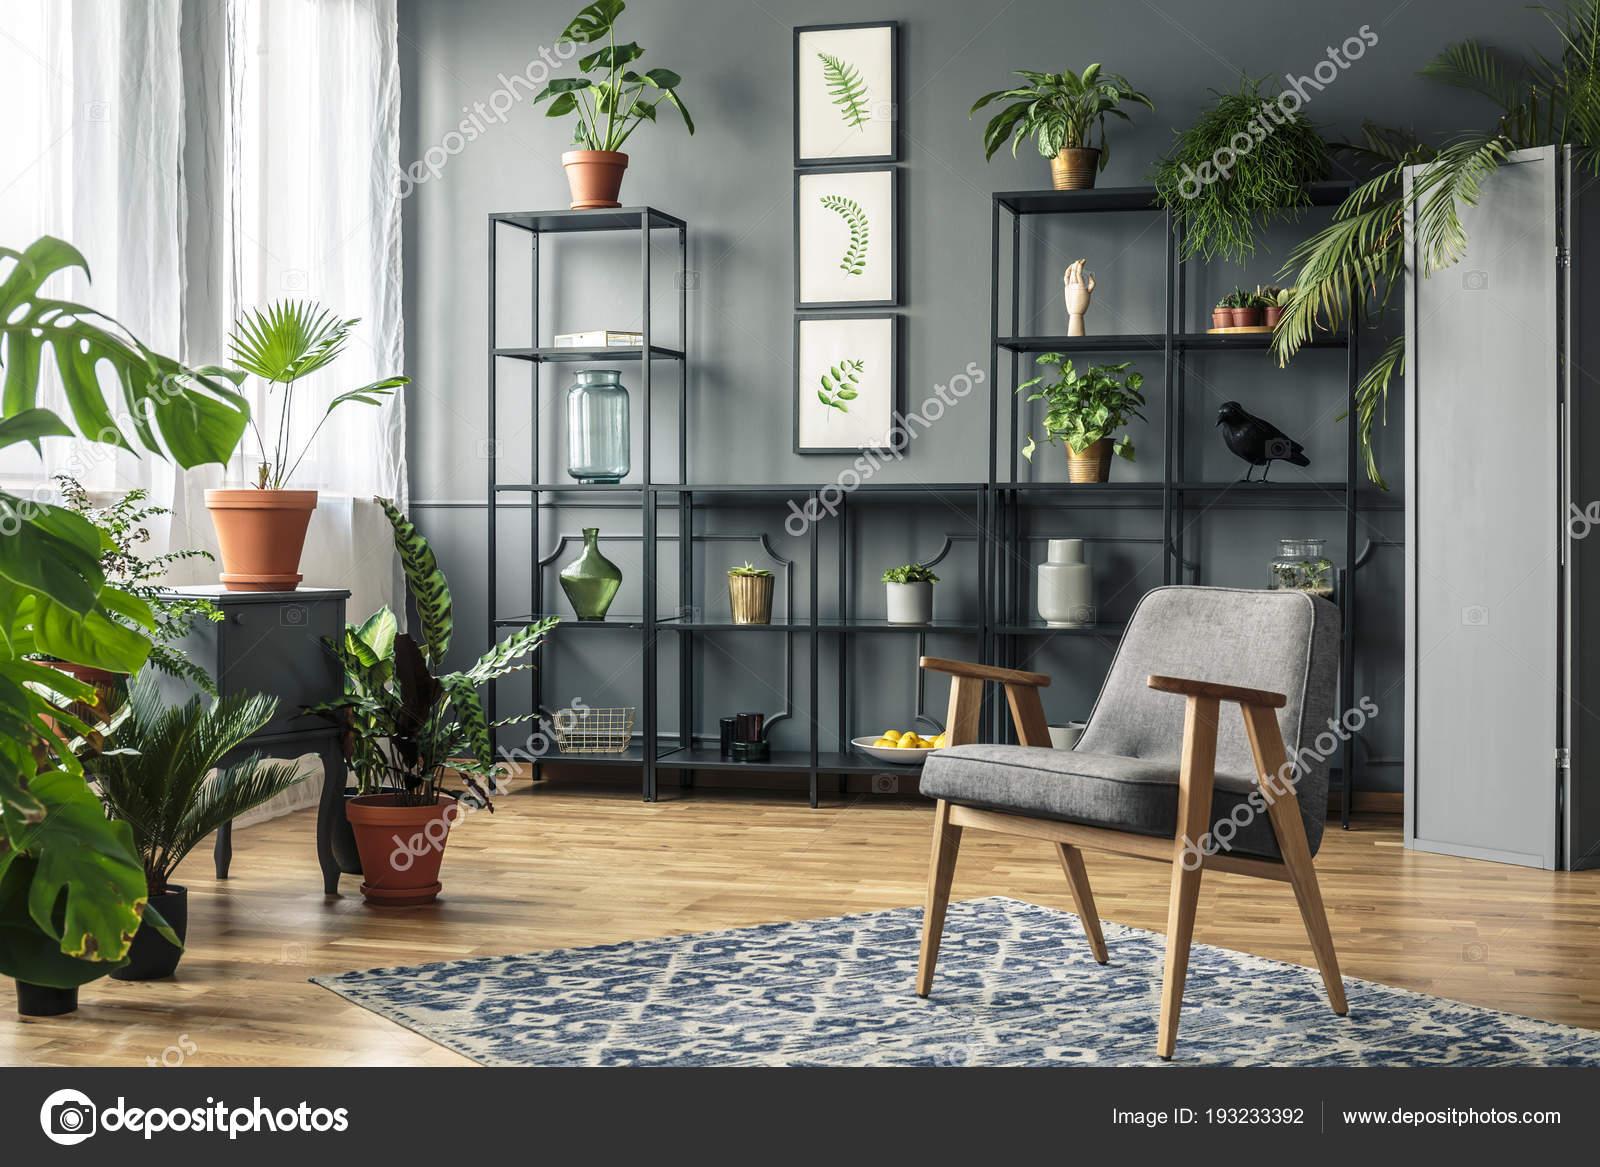 Donkere Vintage Woonkamer : Elegante grijs woonkamer interieur met planten metalen rekken